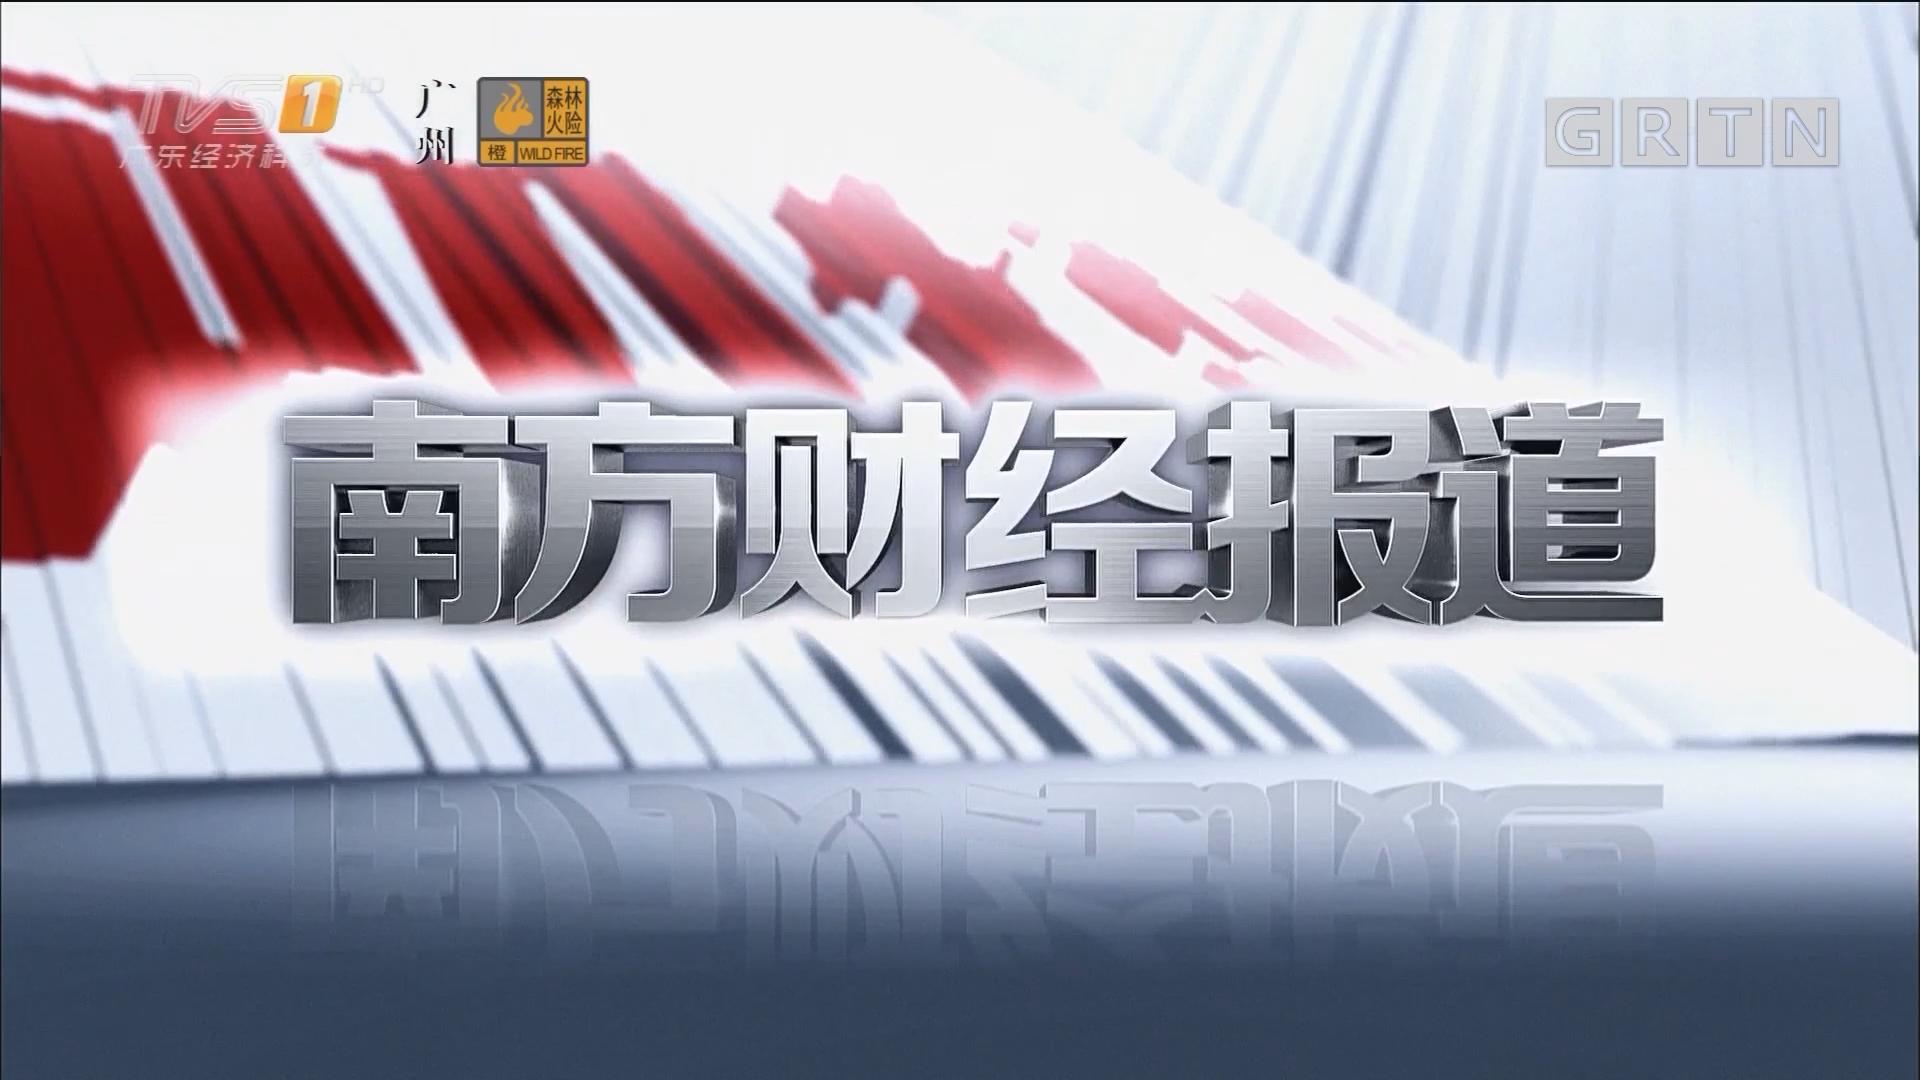 [HD][2018-04-12]南方财经报道:论坛释放更开放信号 海南将迎来新的发展机遇